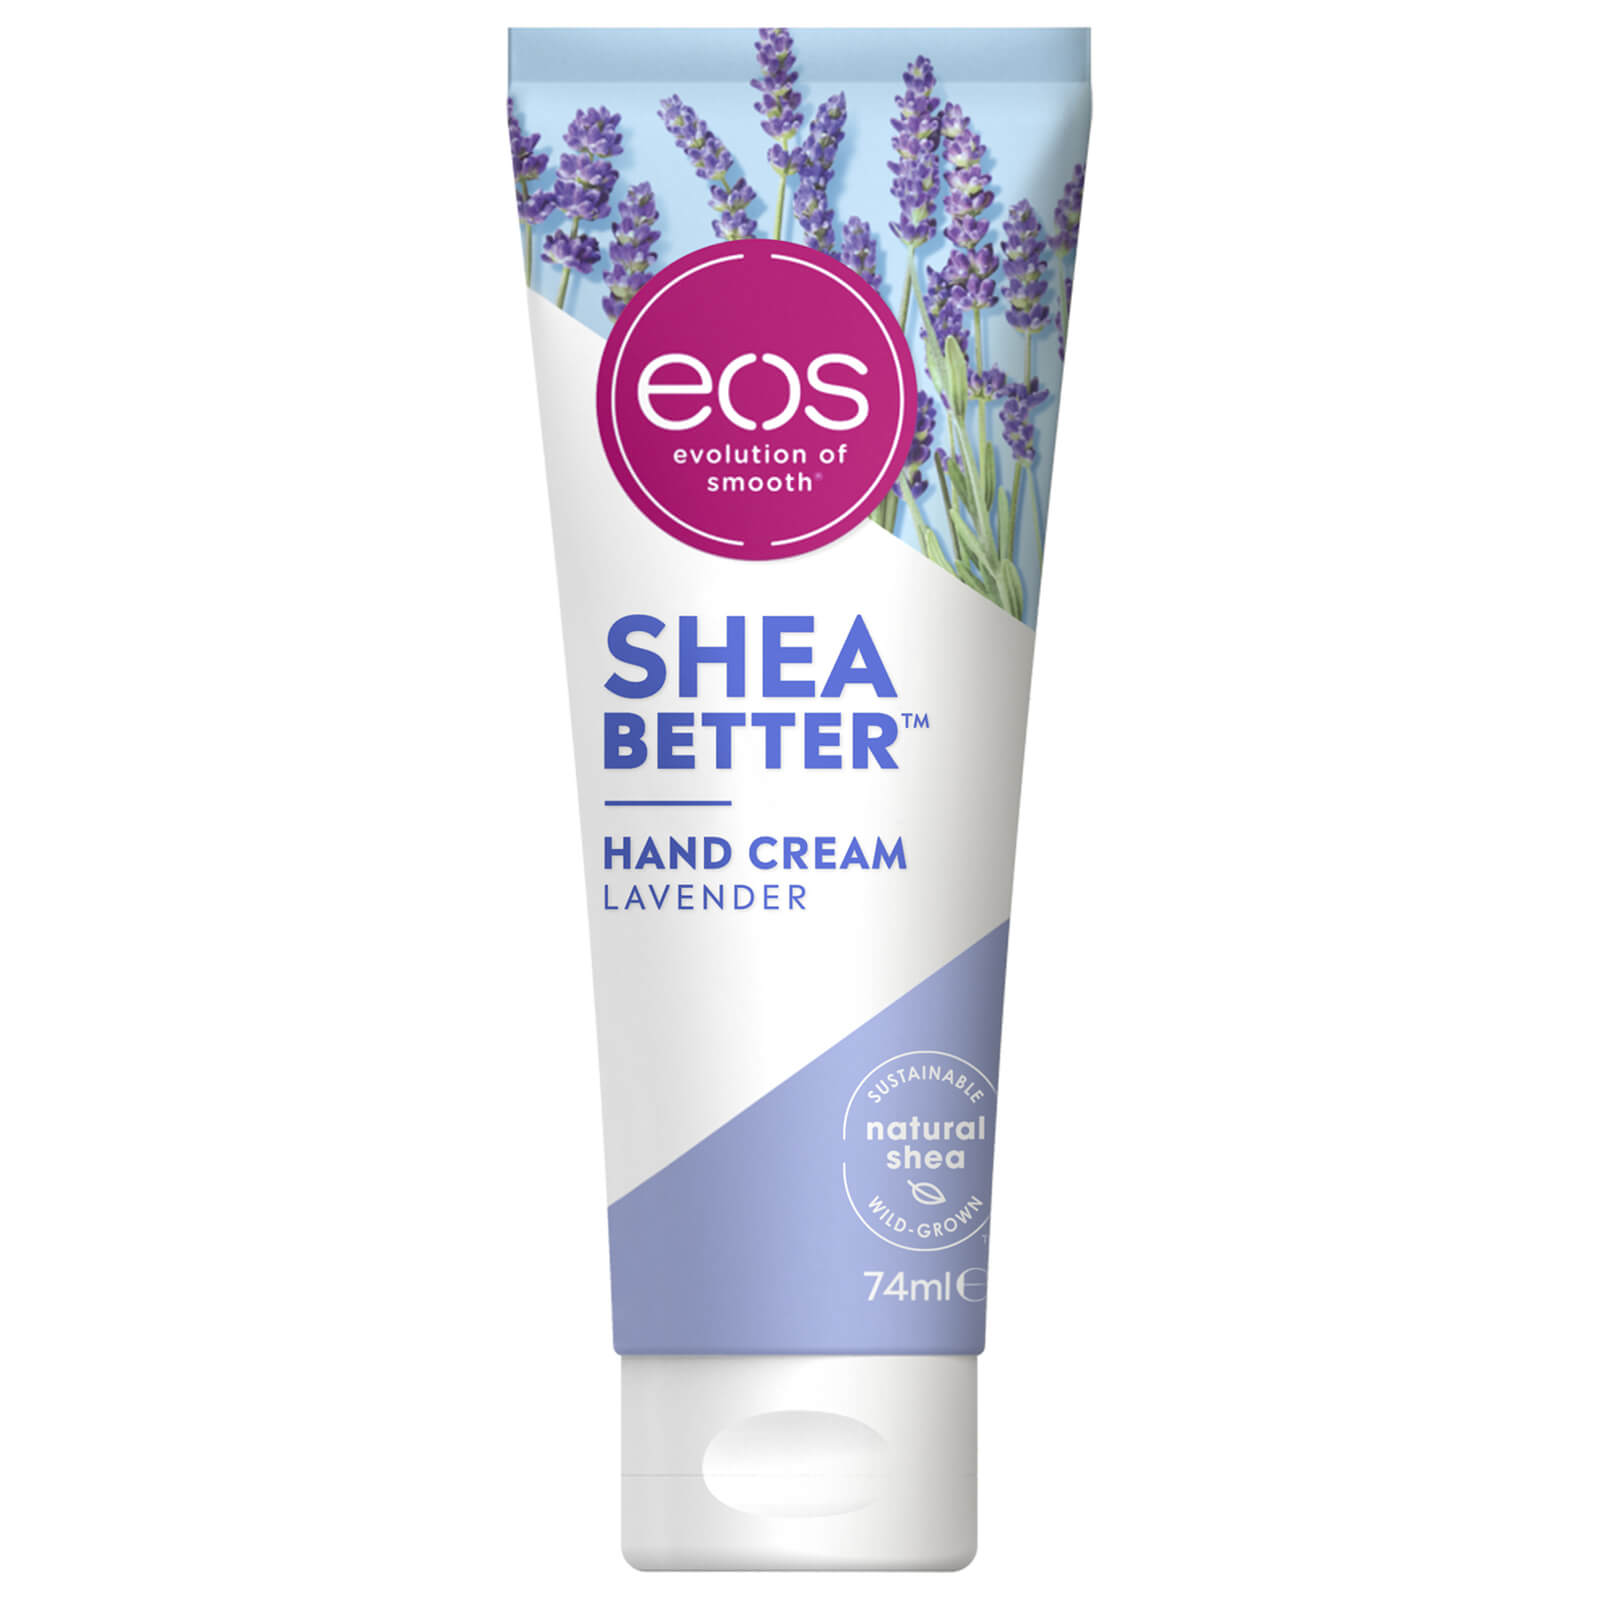 EOS Shea Butter Lavender Hand Cream 74ml  - Купить